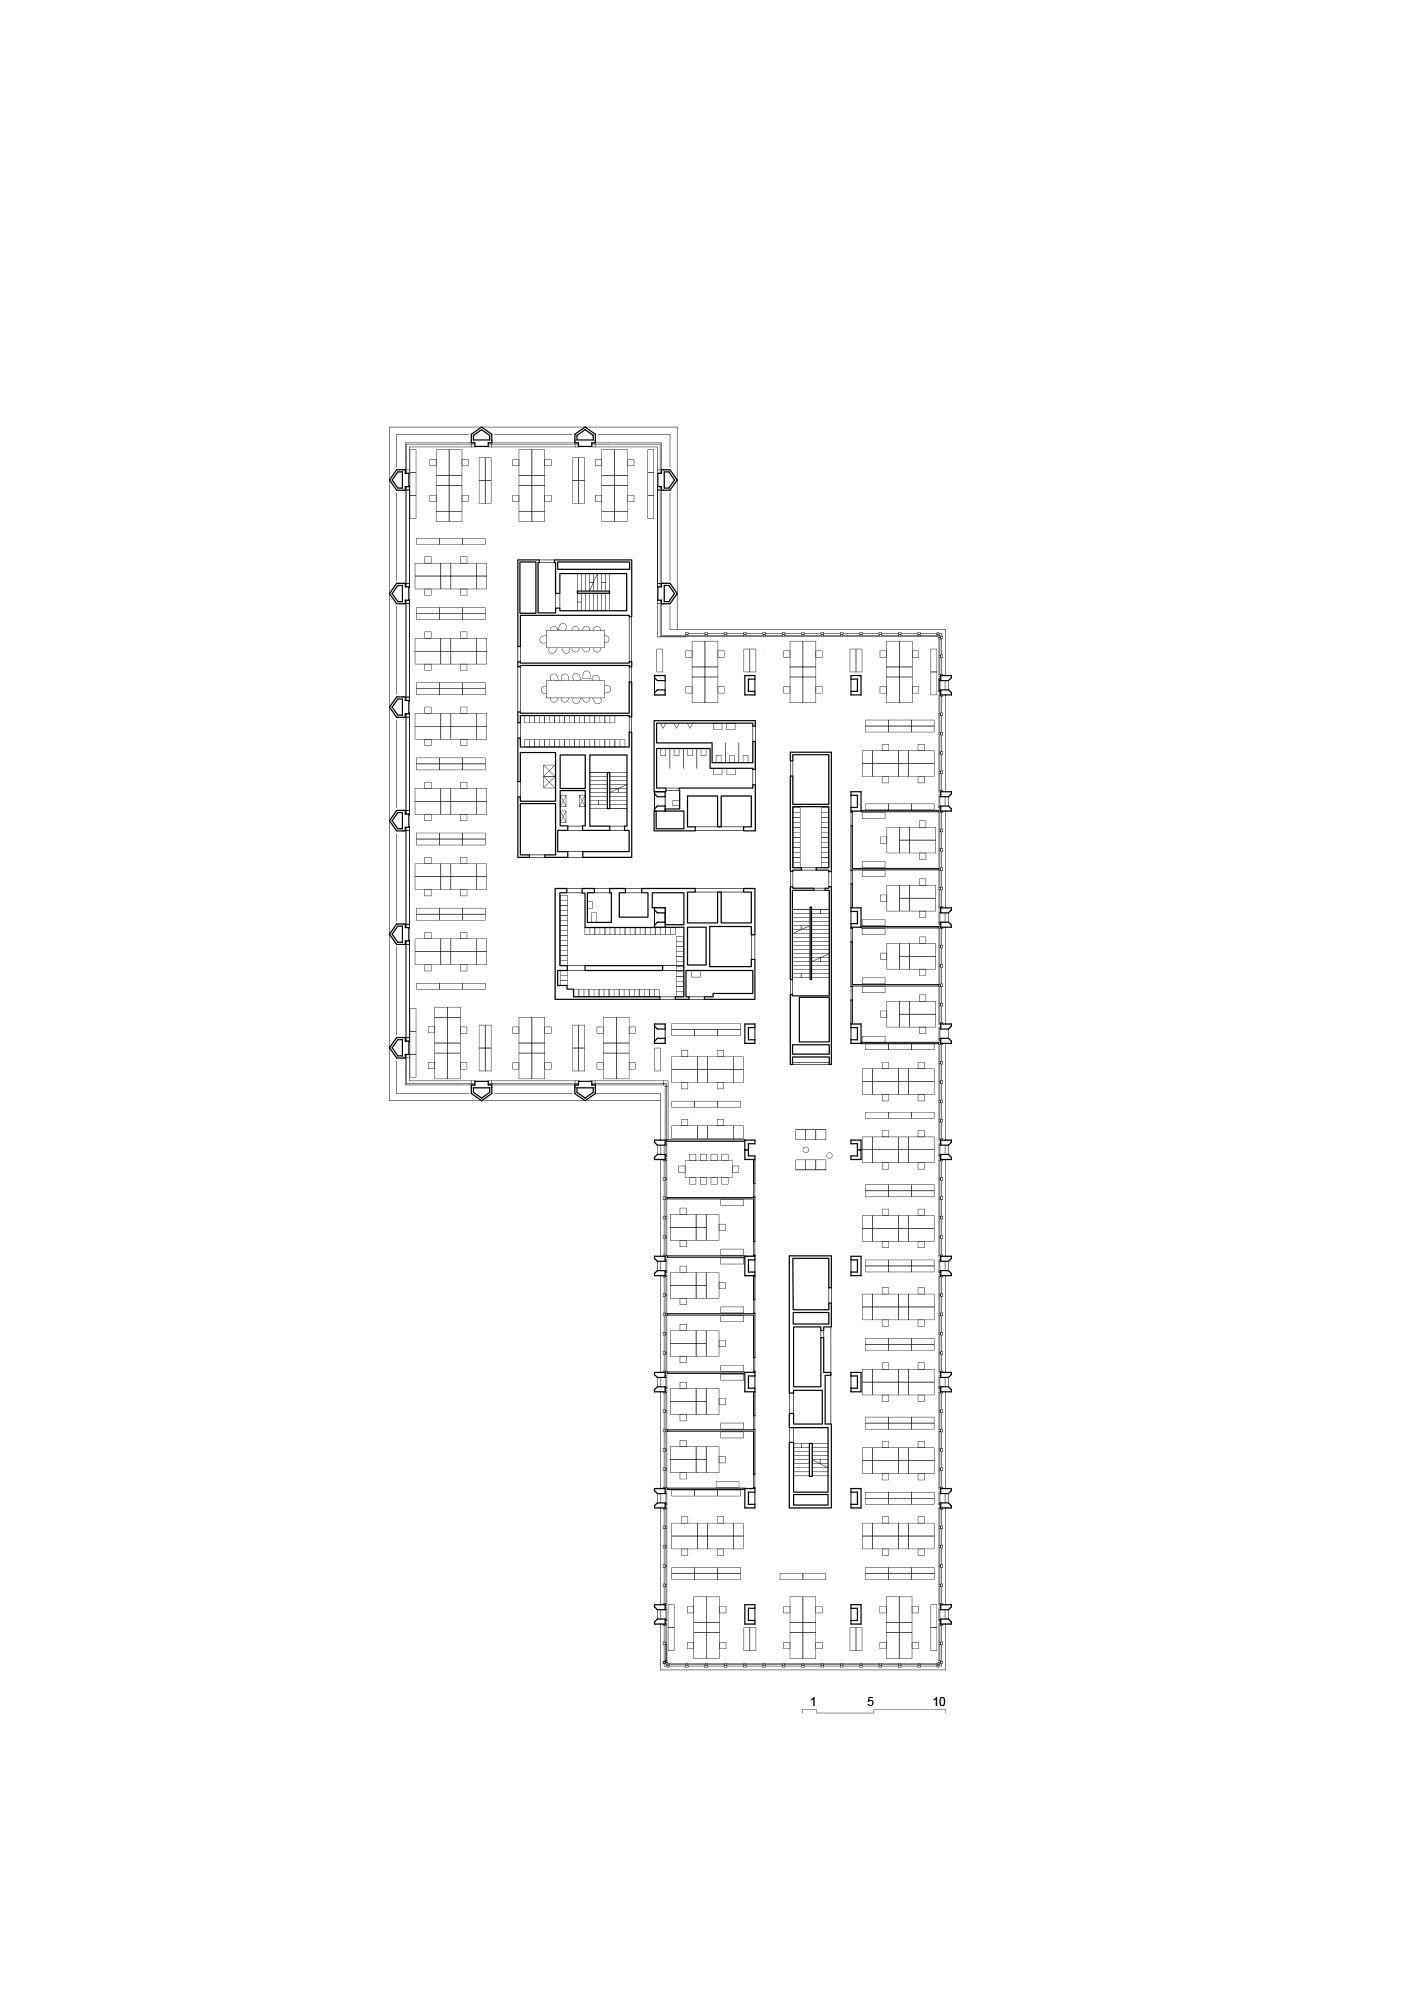 Bruther   50 Apartamentos   Limeil  Brévannes, Francia   2009   Correcta  Distribución De Apartamentos En Varios Tamaños. Acceso Tradicional Por Galu2026